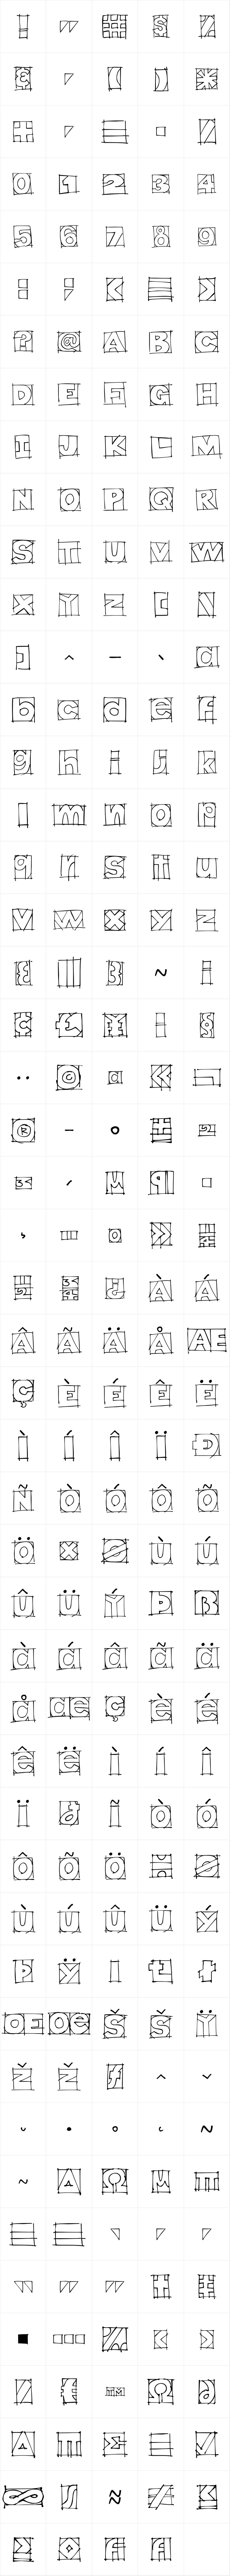 Doodles the Alphabet